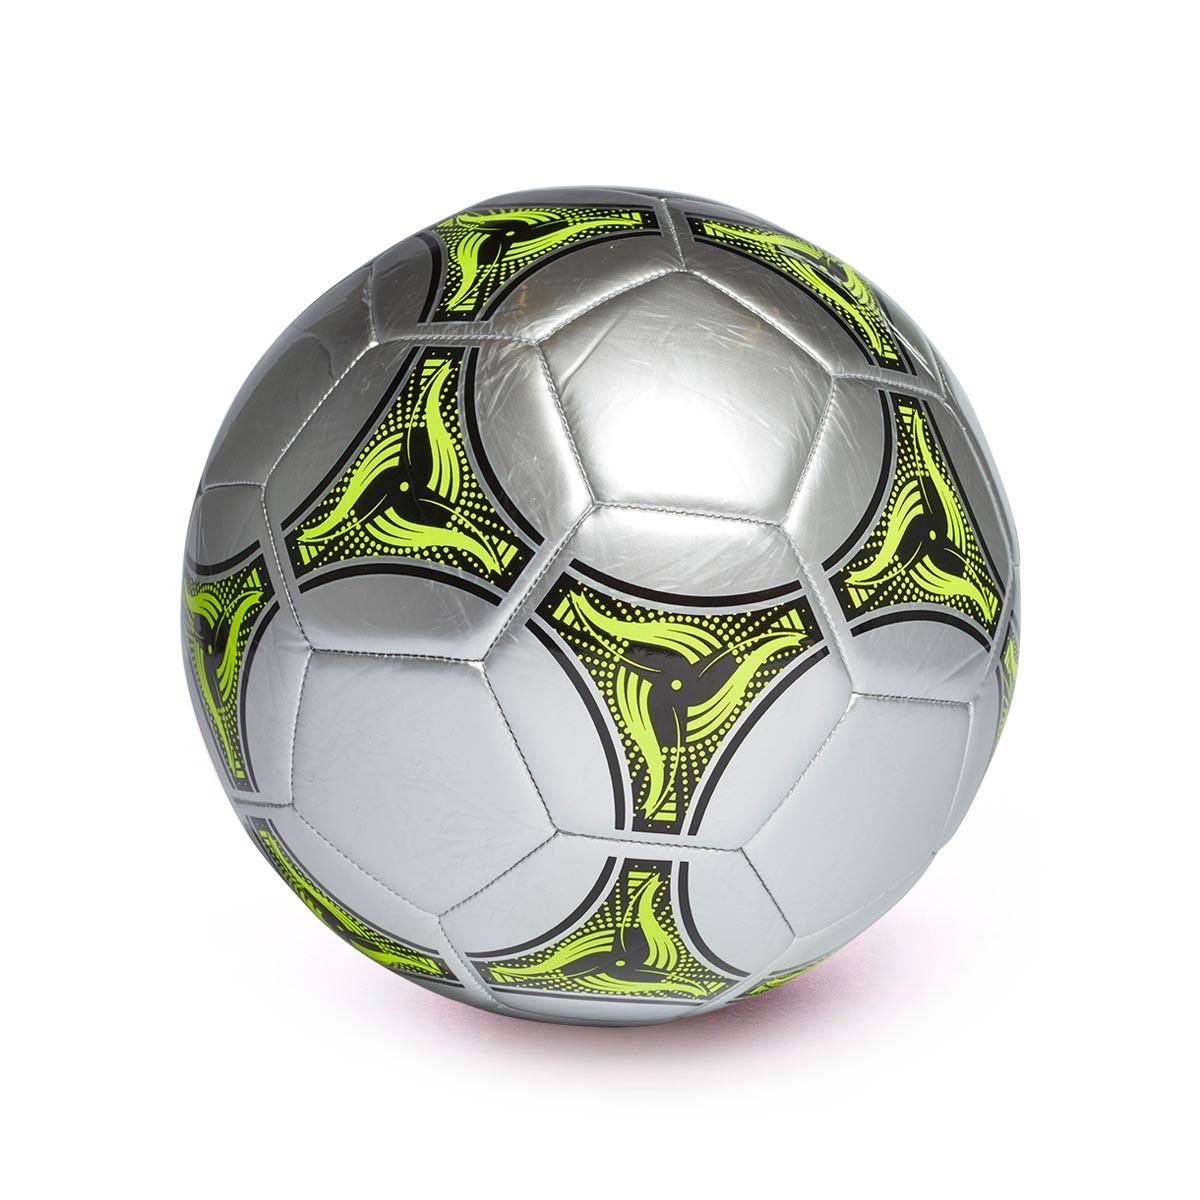 5bdd08dcd Ball adidas Conext 19 Capitano Silver metallic-Black-Solar yellow -  Football store Fútbol Emotion